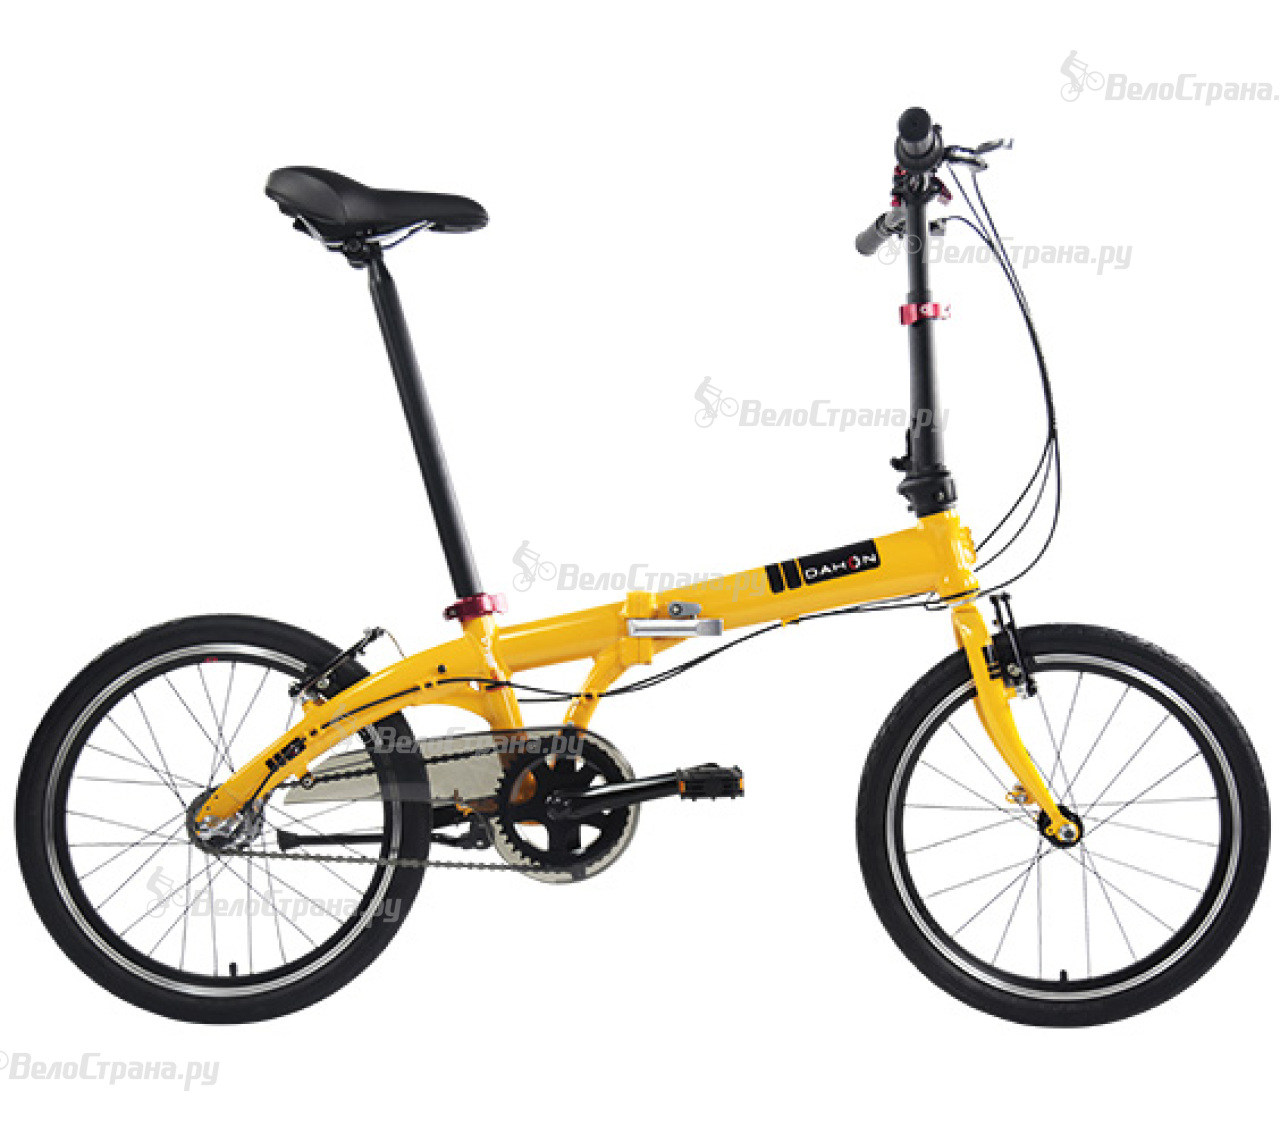 Велосипед Dahon Vybe i3 (2017) велосипед dahon vybe d7 u 2017